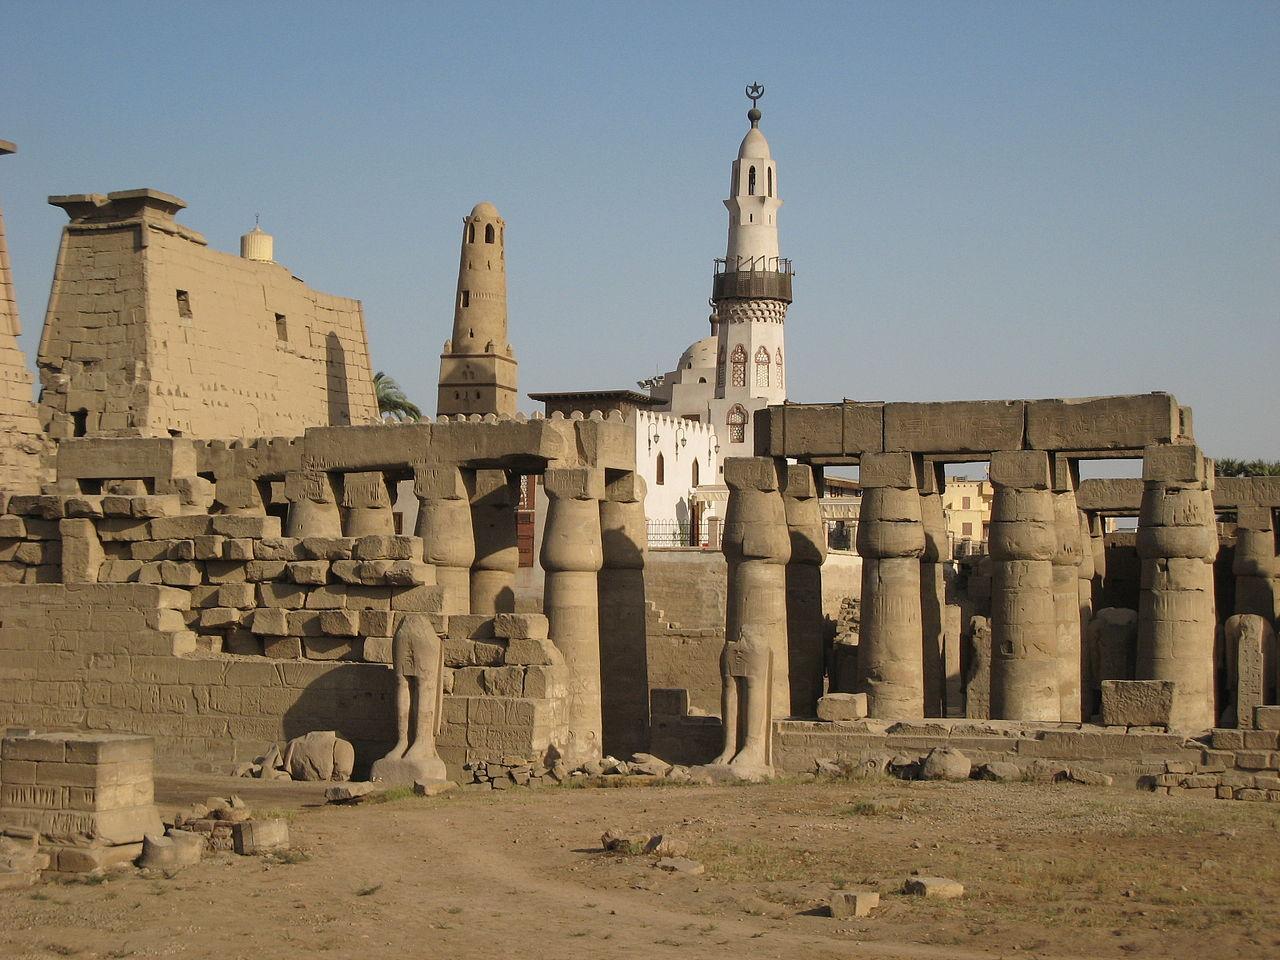 Luxor, photo by Karen Green